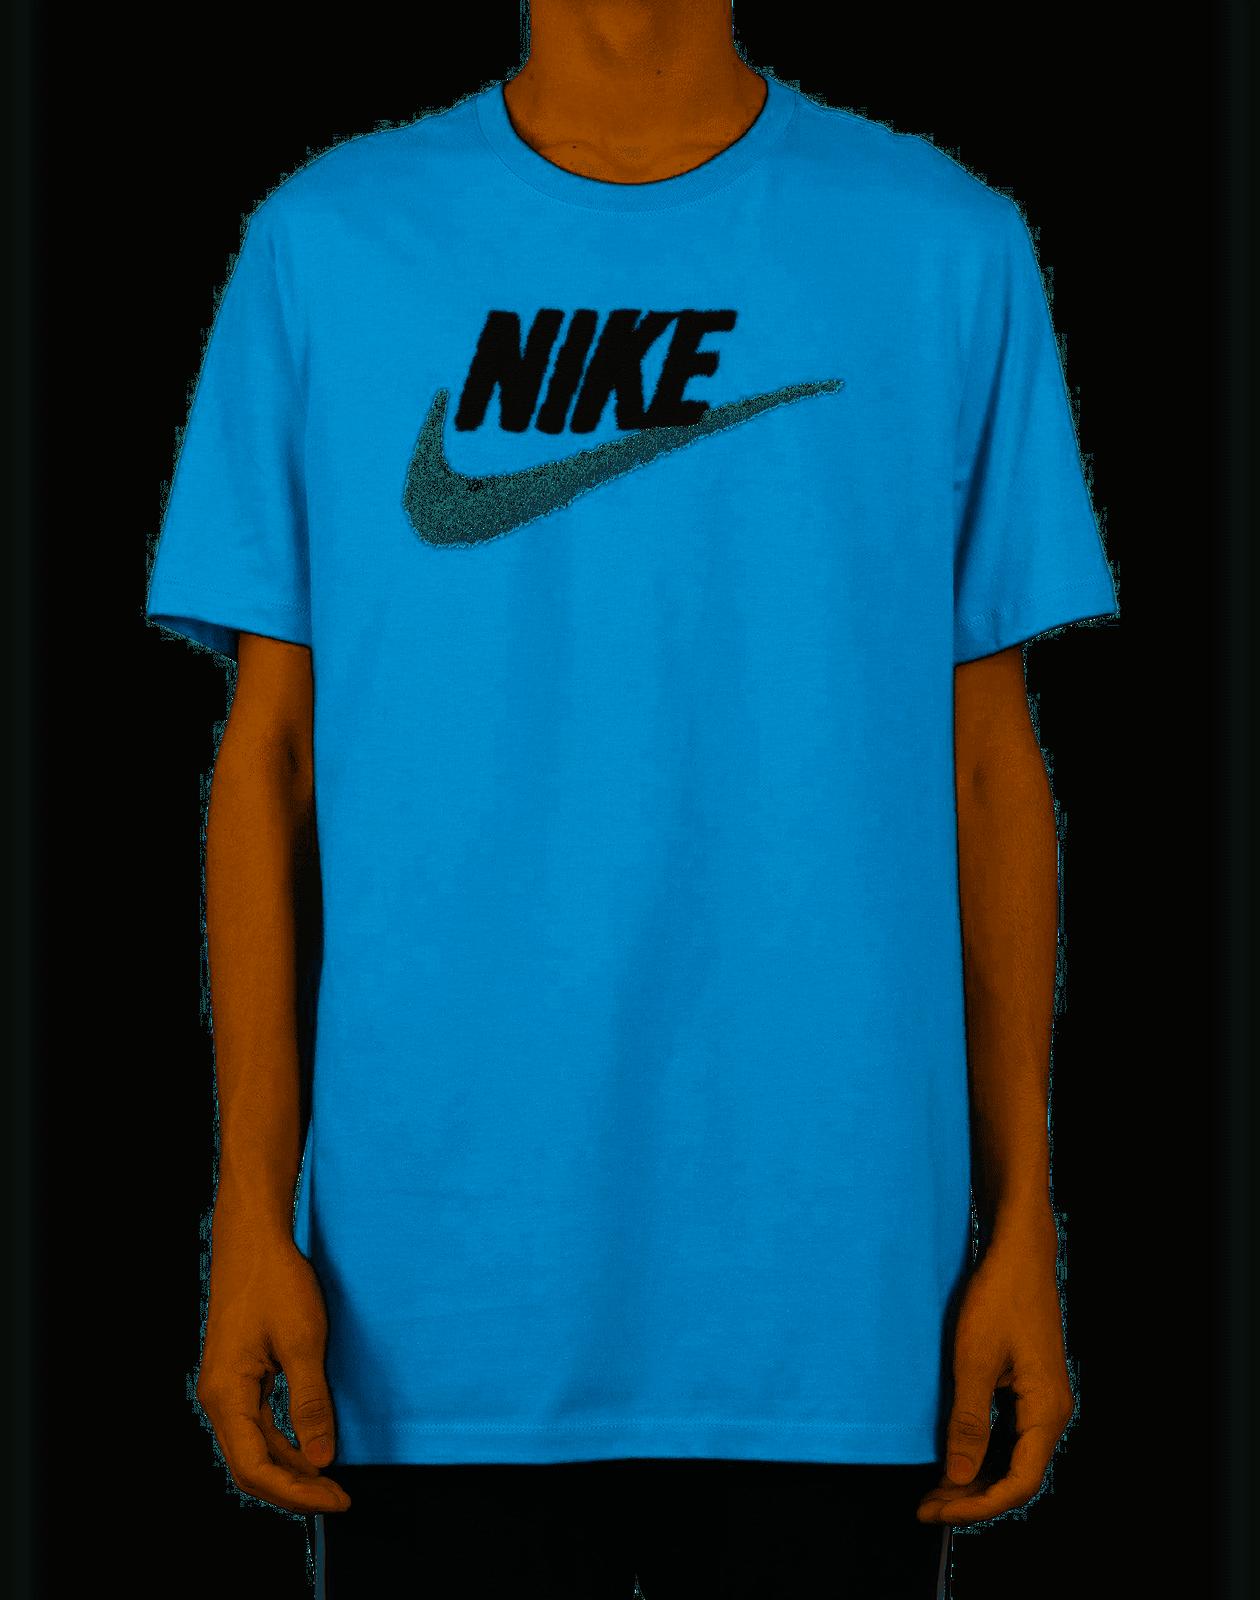 Nike Graphic logo Men's T-Shirt Blue size Large - T-Shirts - Nike Logo T-Shirt